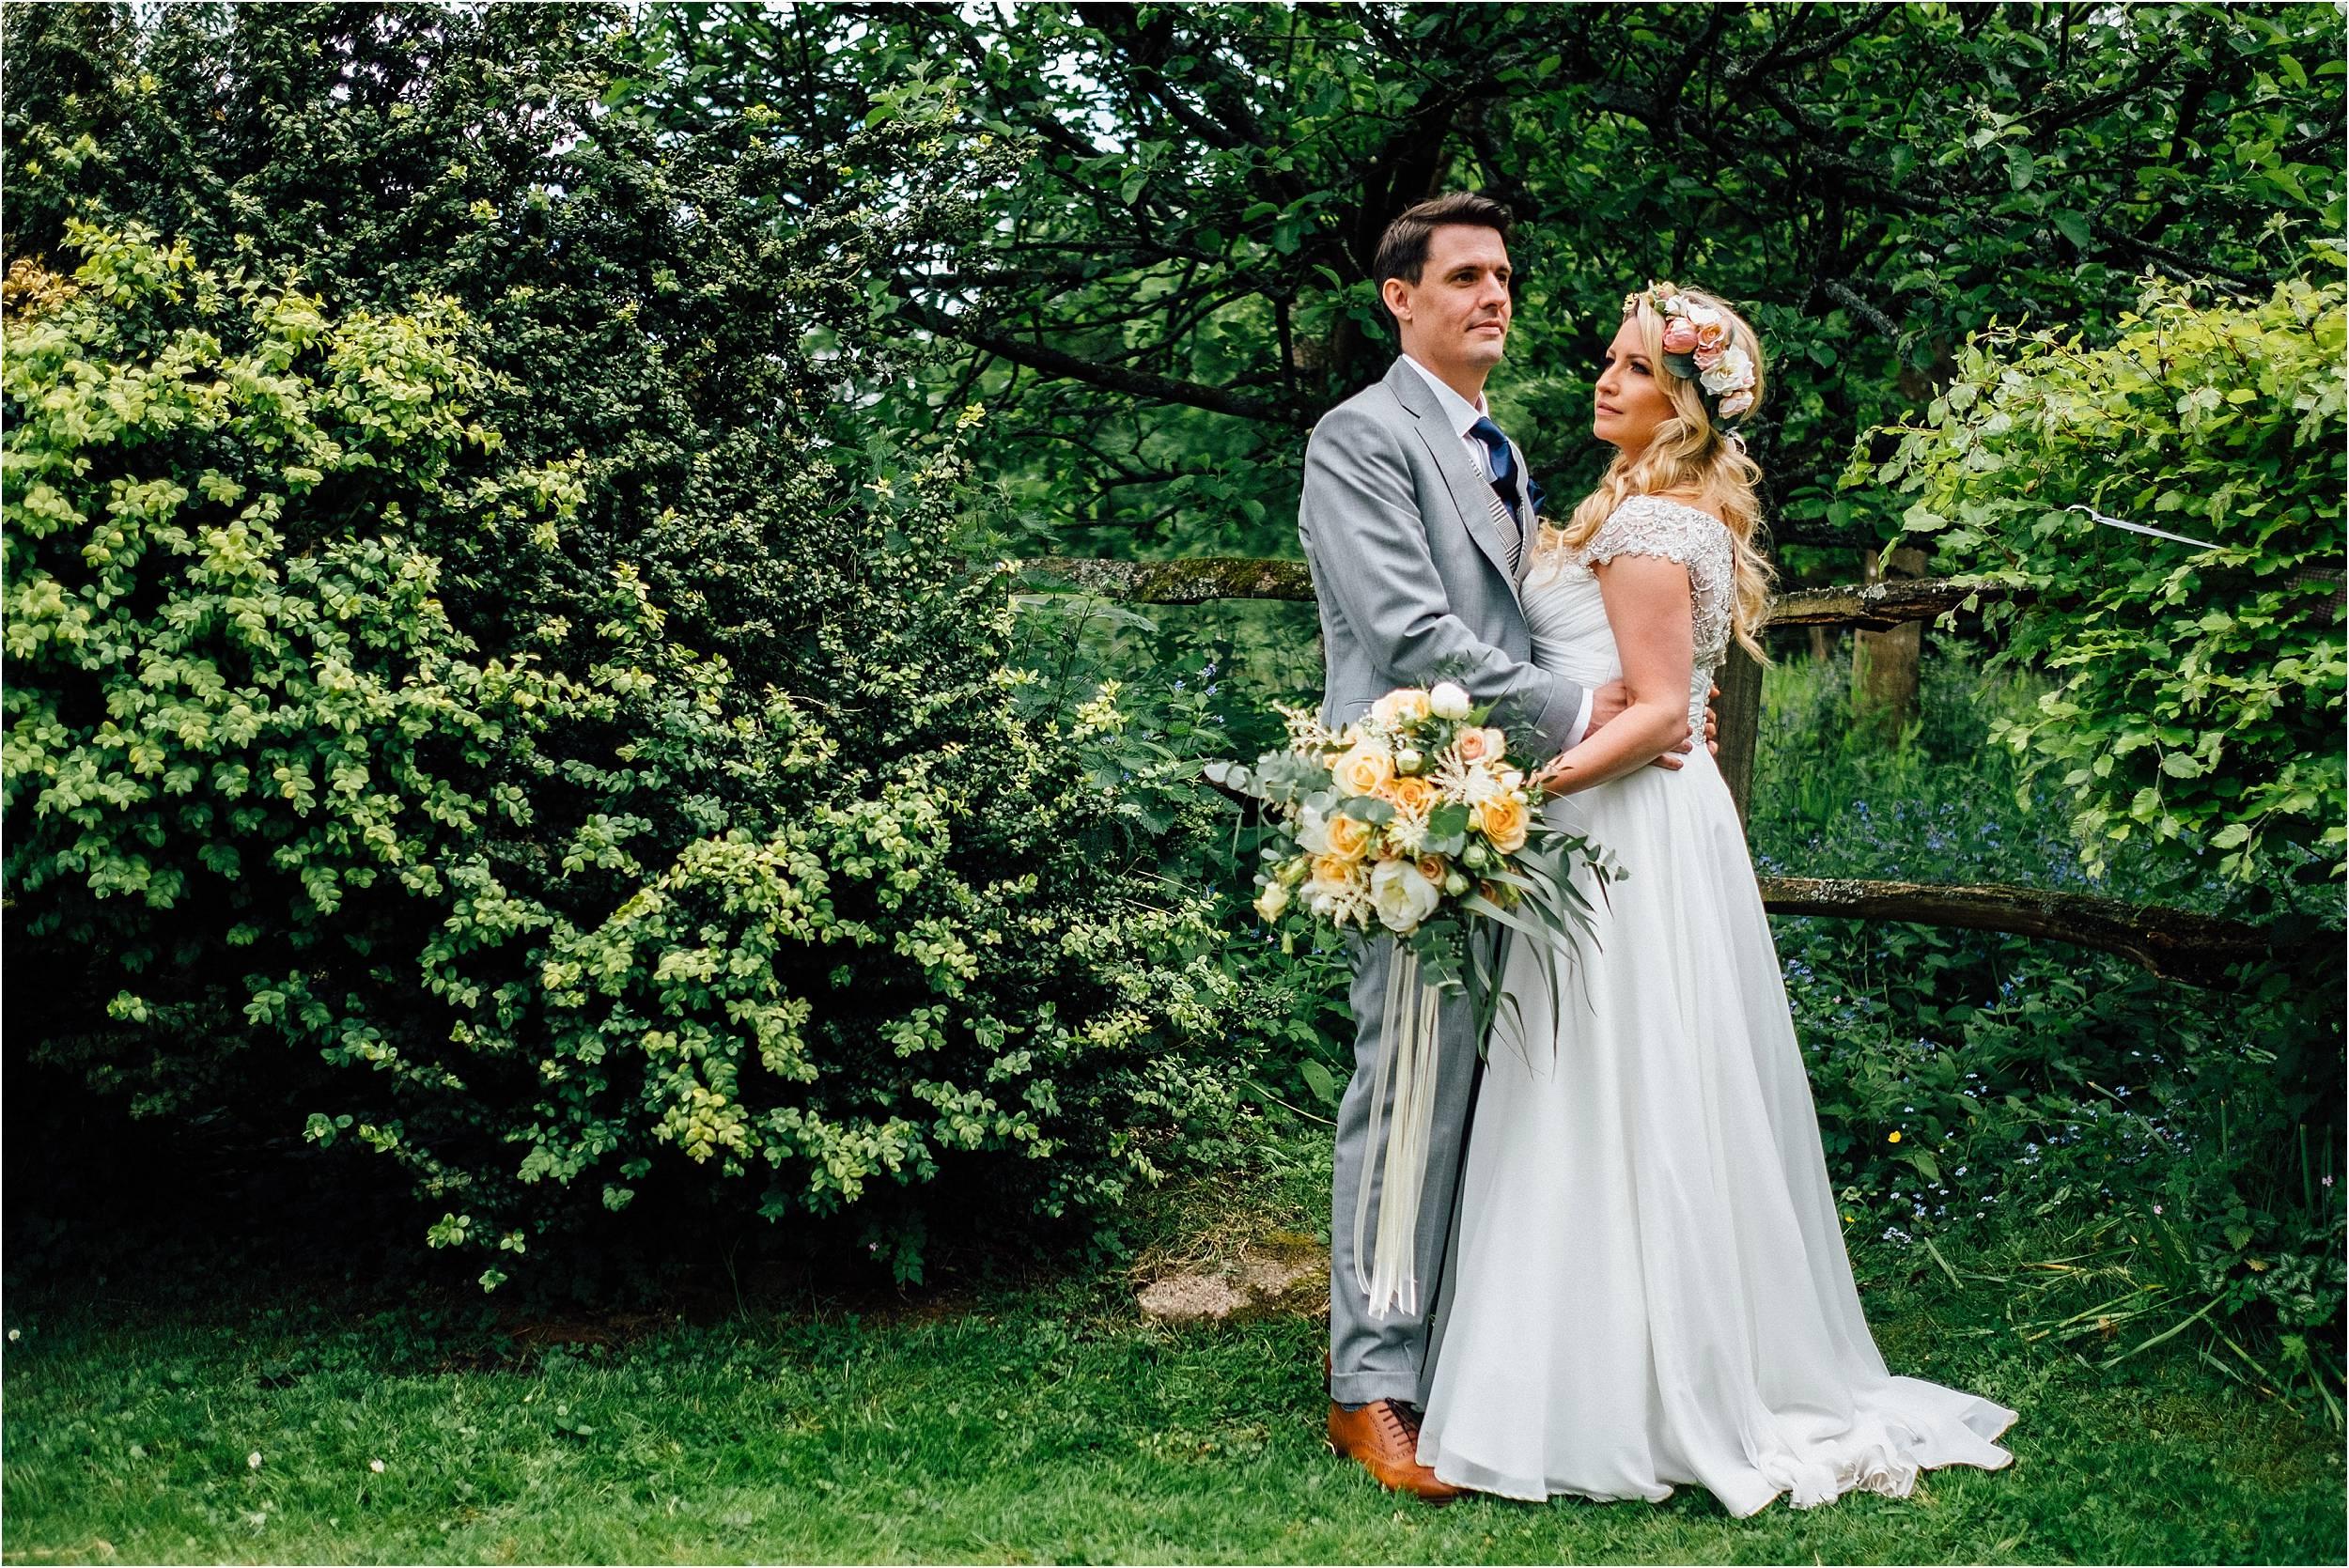 Surrey Hookhouse Farm Wedding Photographer_0096.jpg